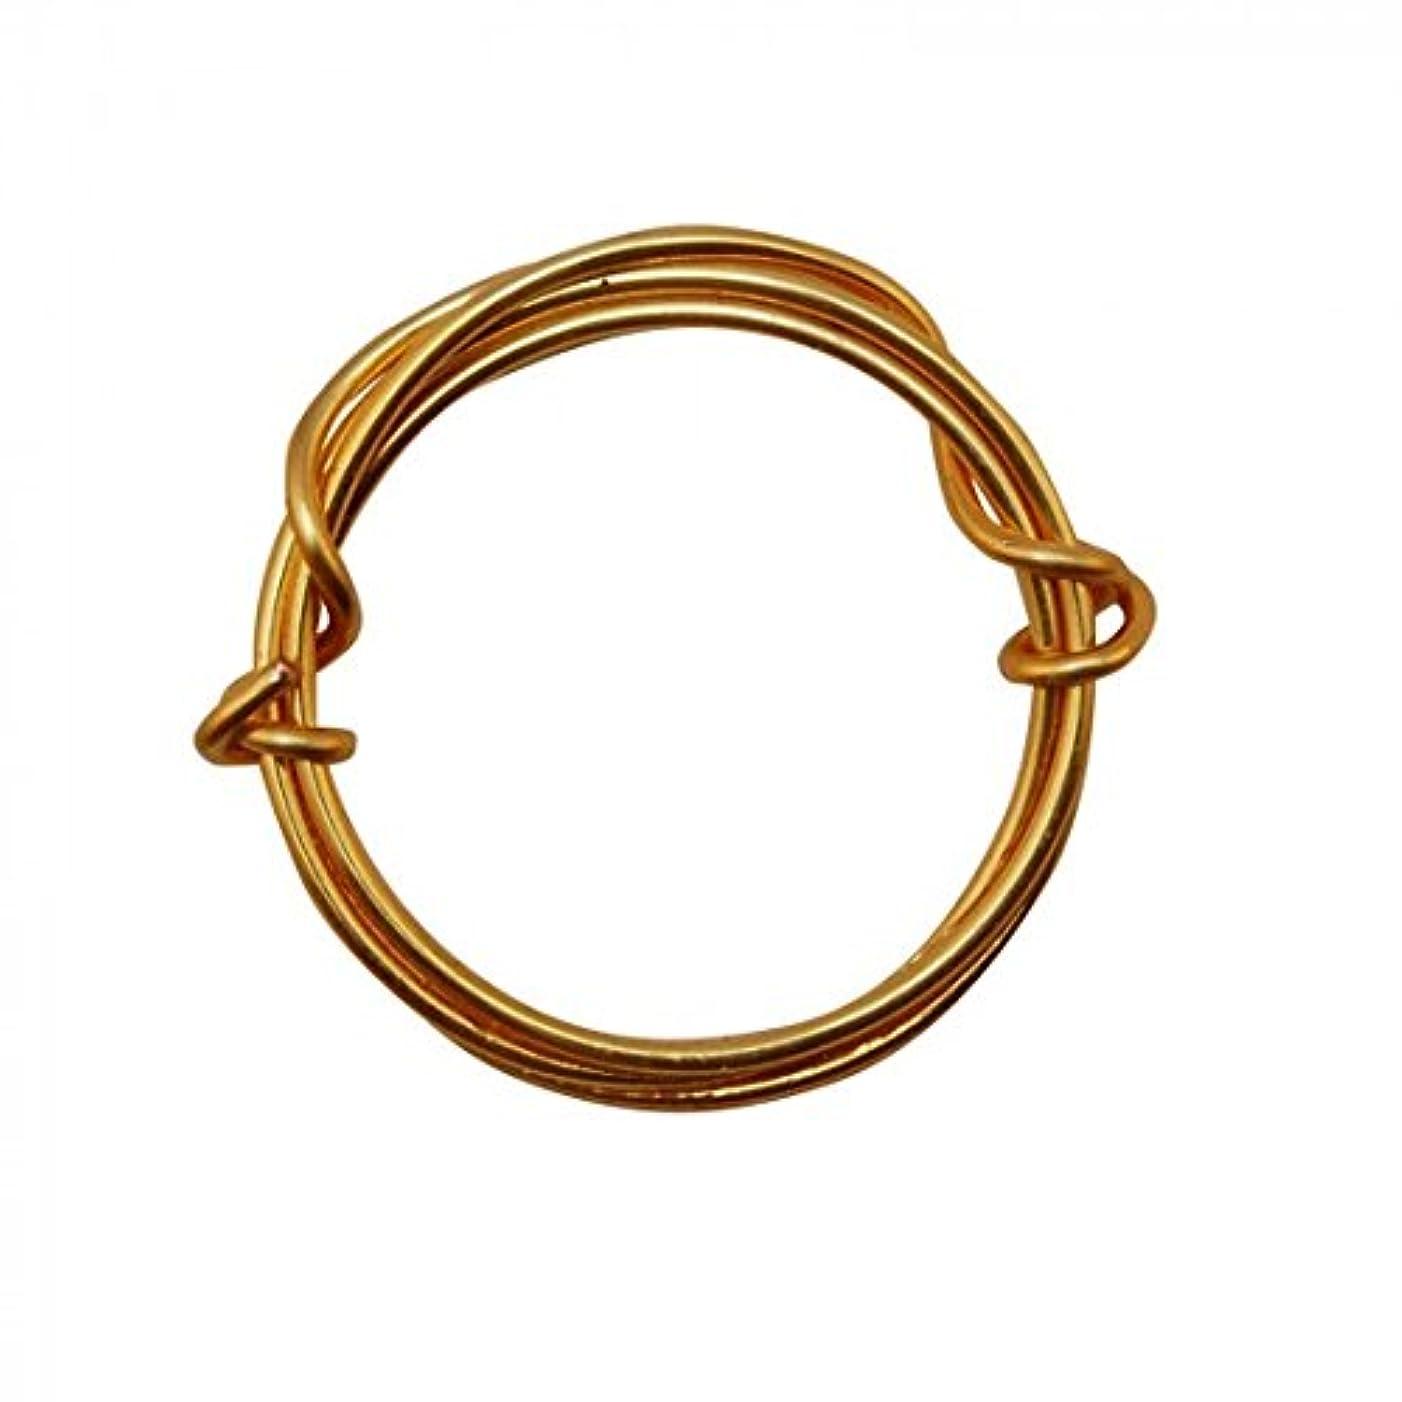 Vaessen Creative Copper Wire, Metal, Gold, One Size